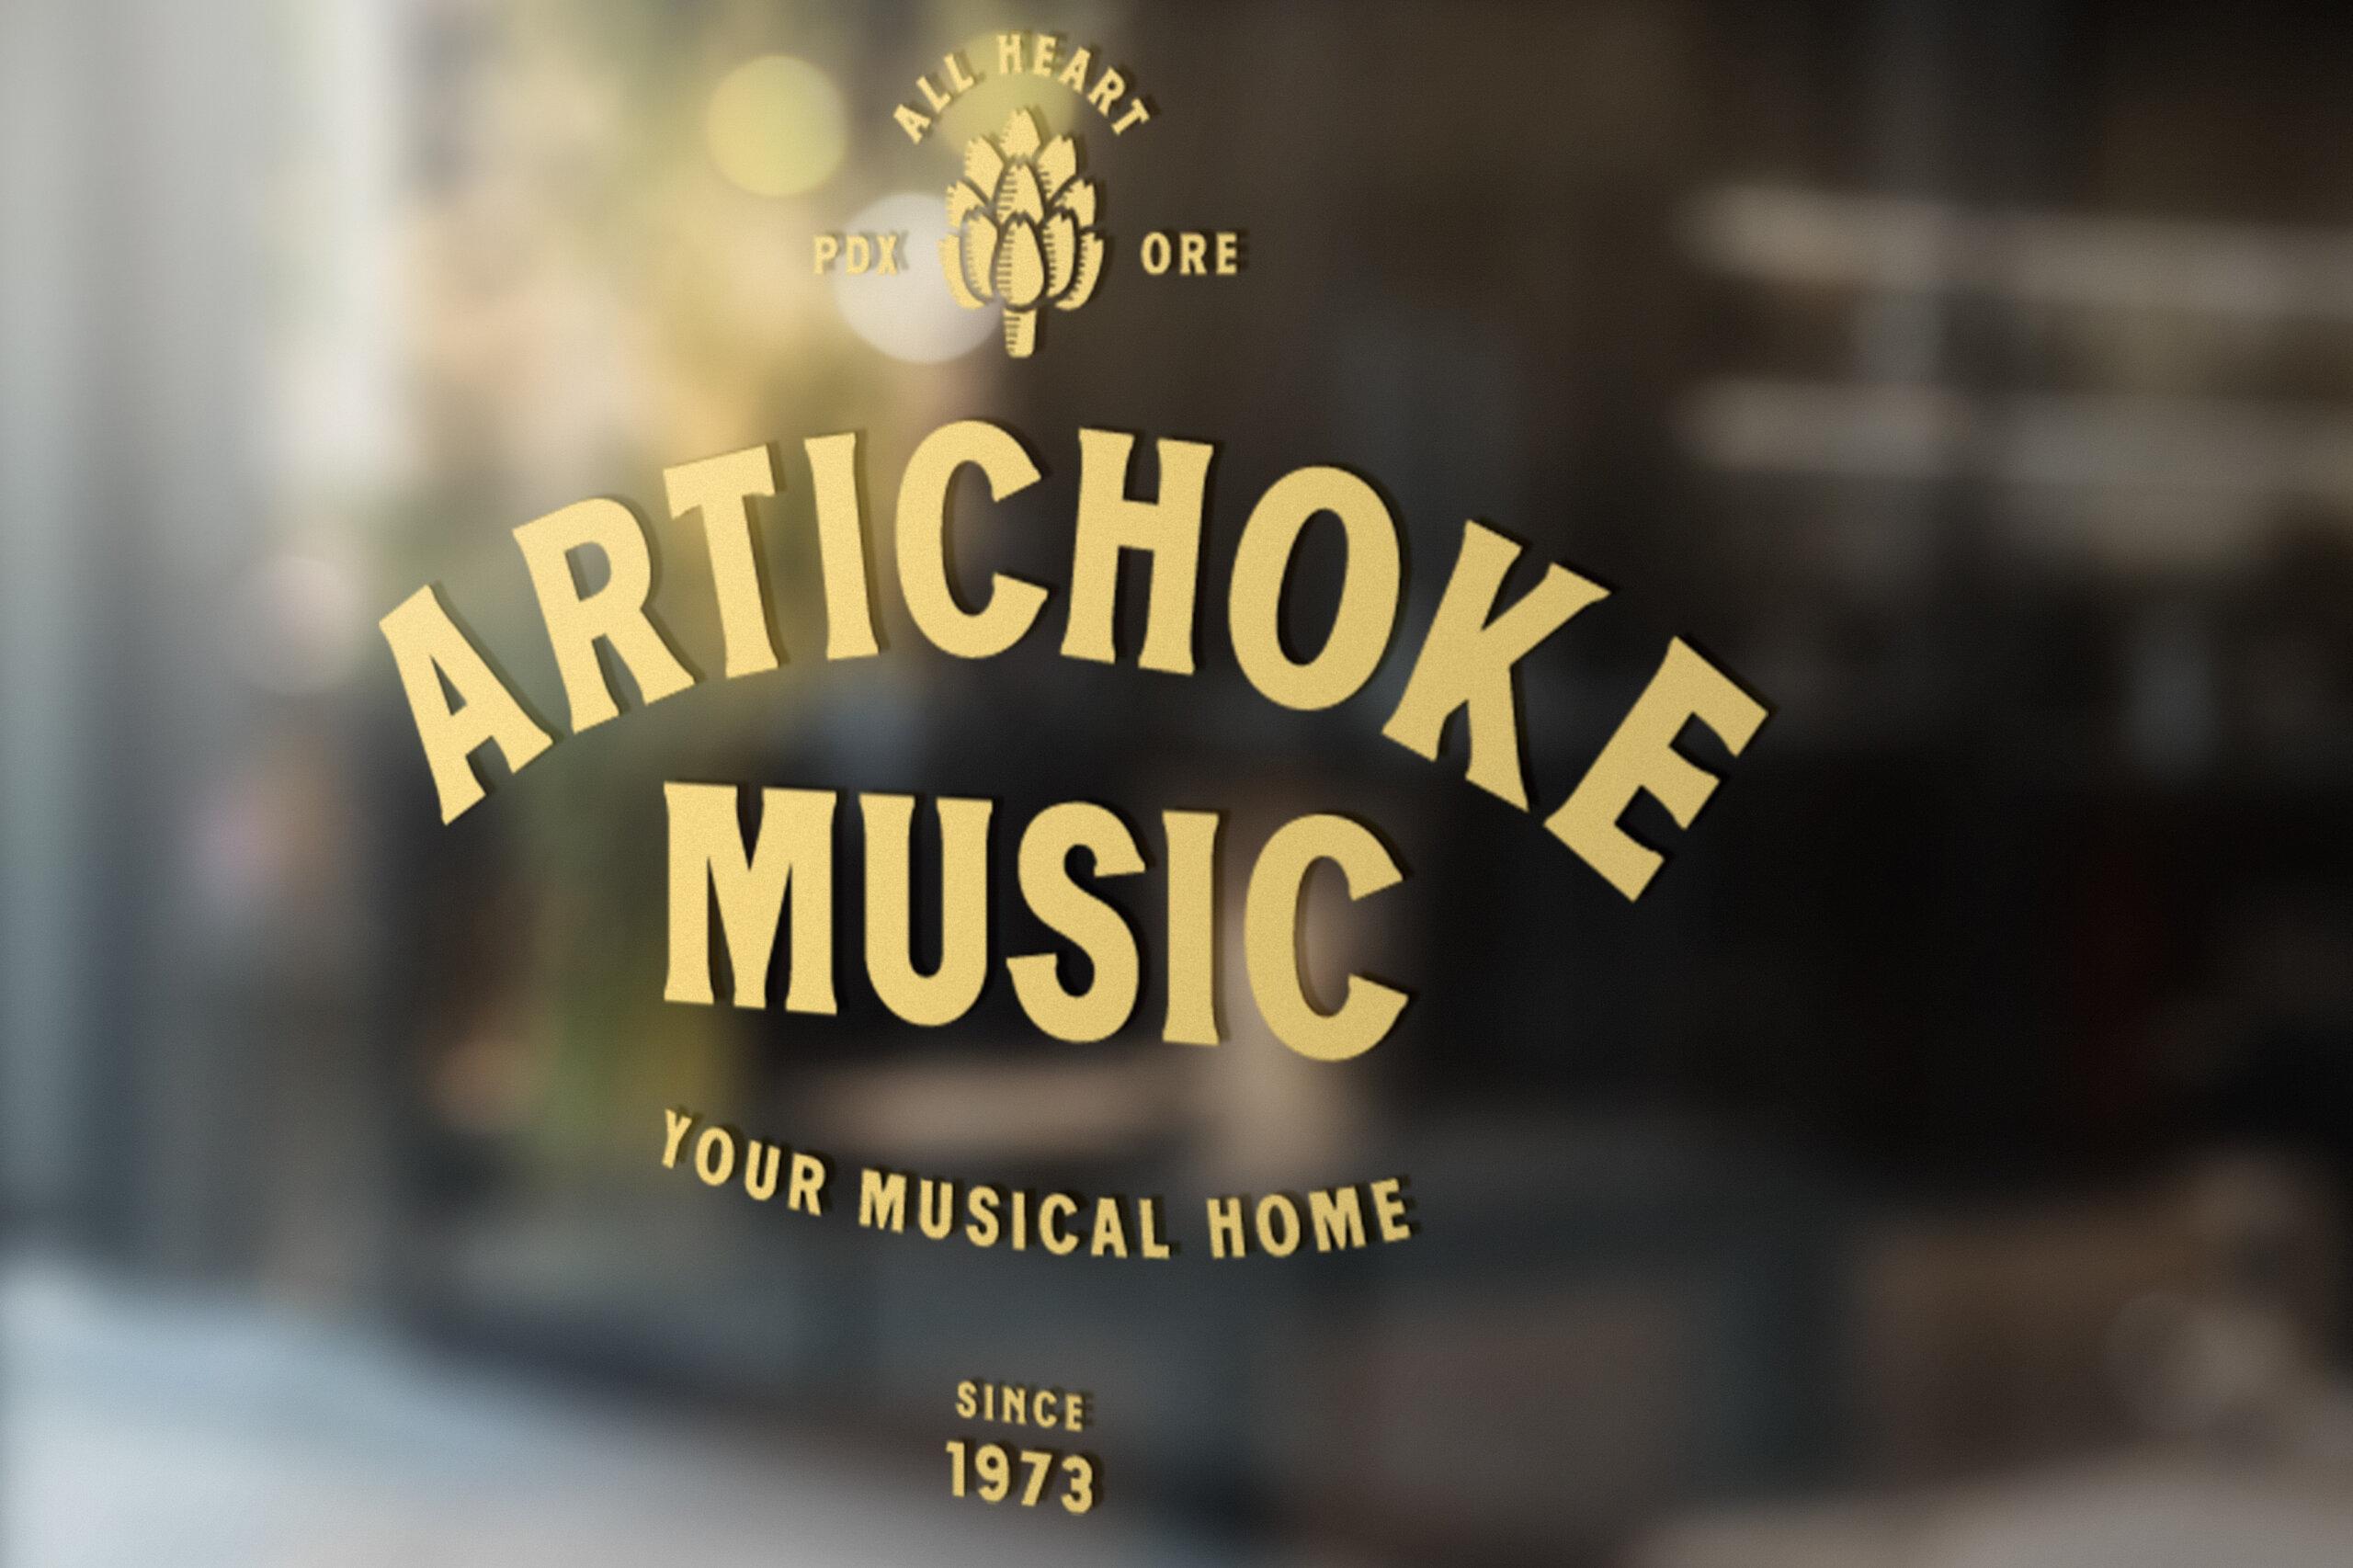 Artichoke Music Window Sign